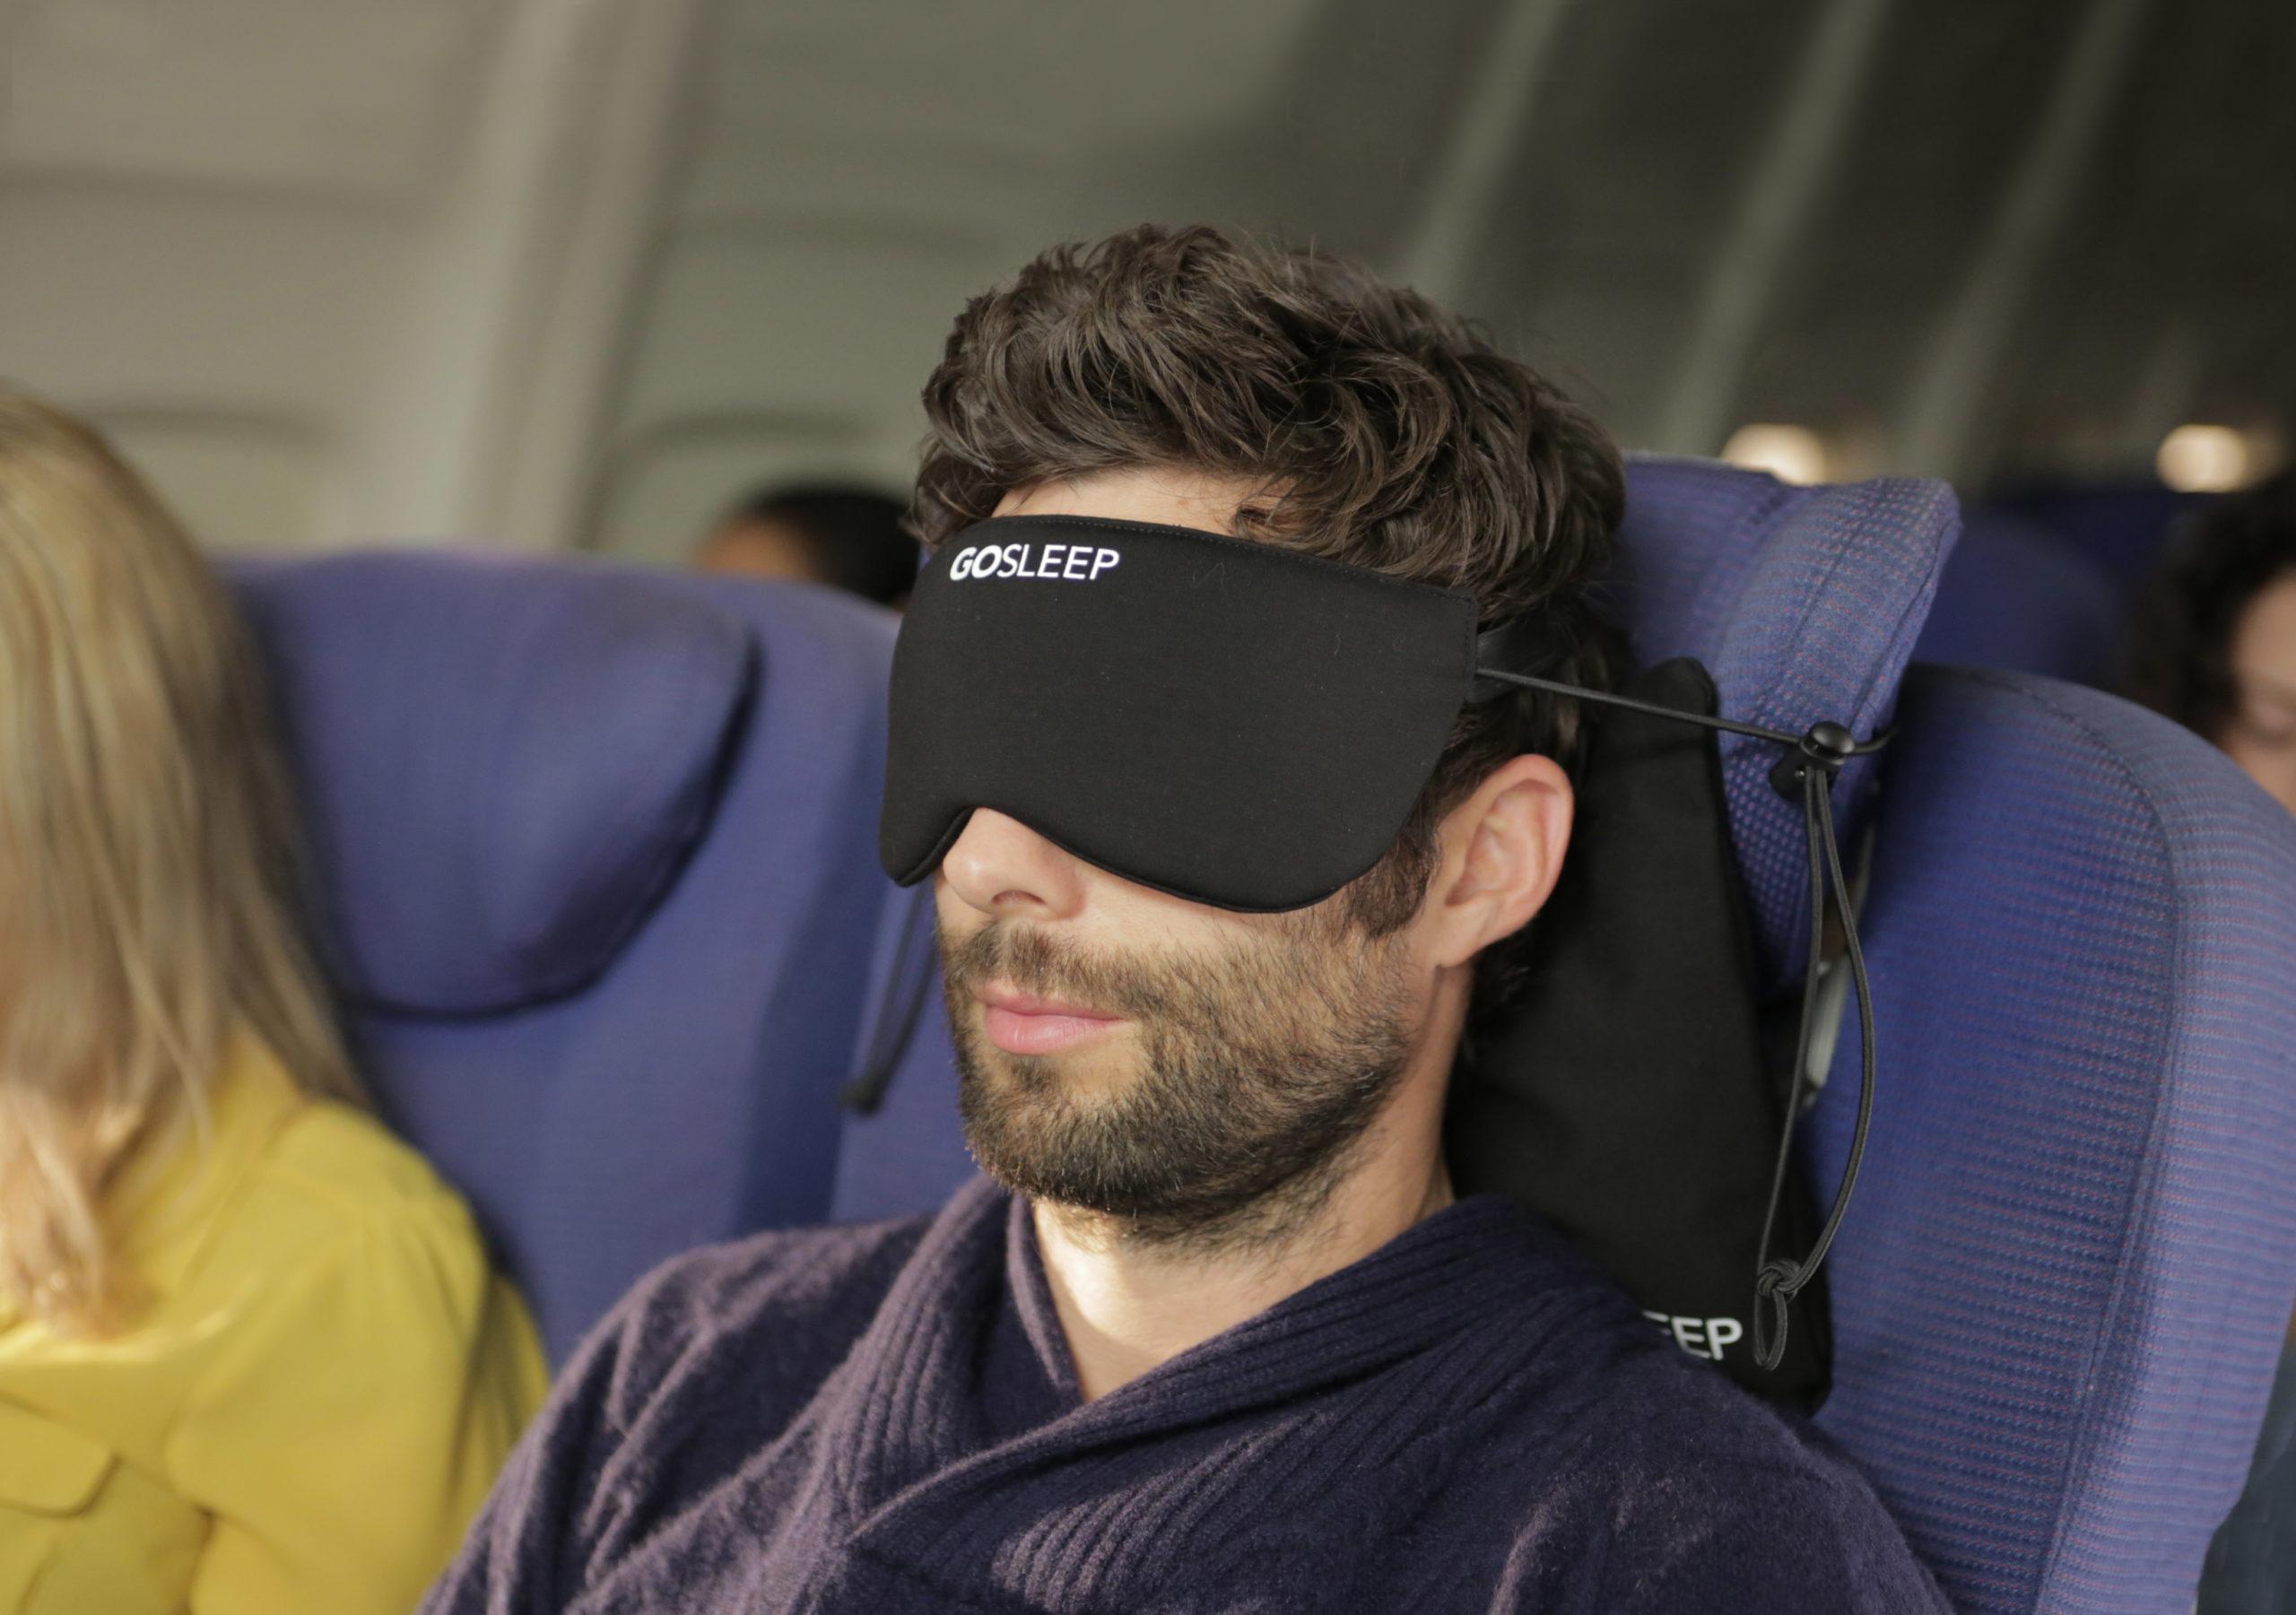 gosleep travel system jet black